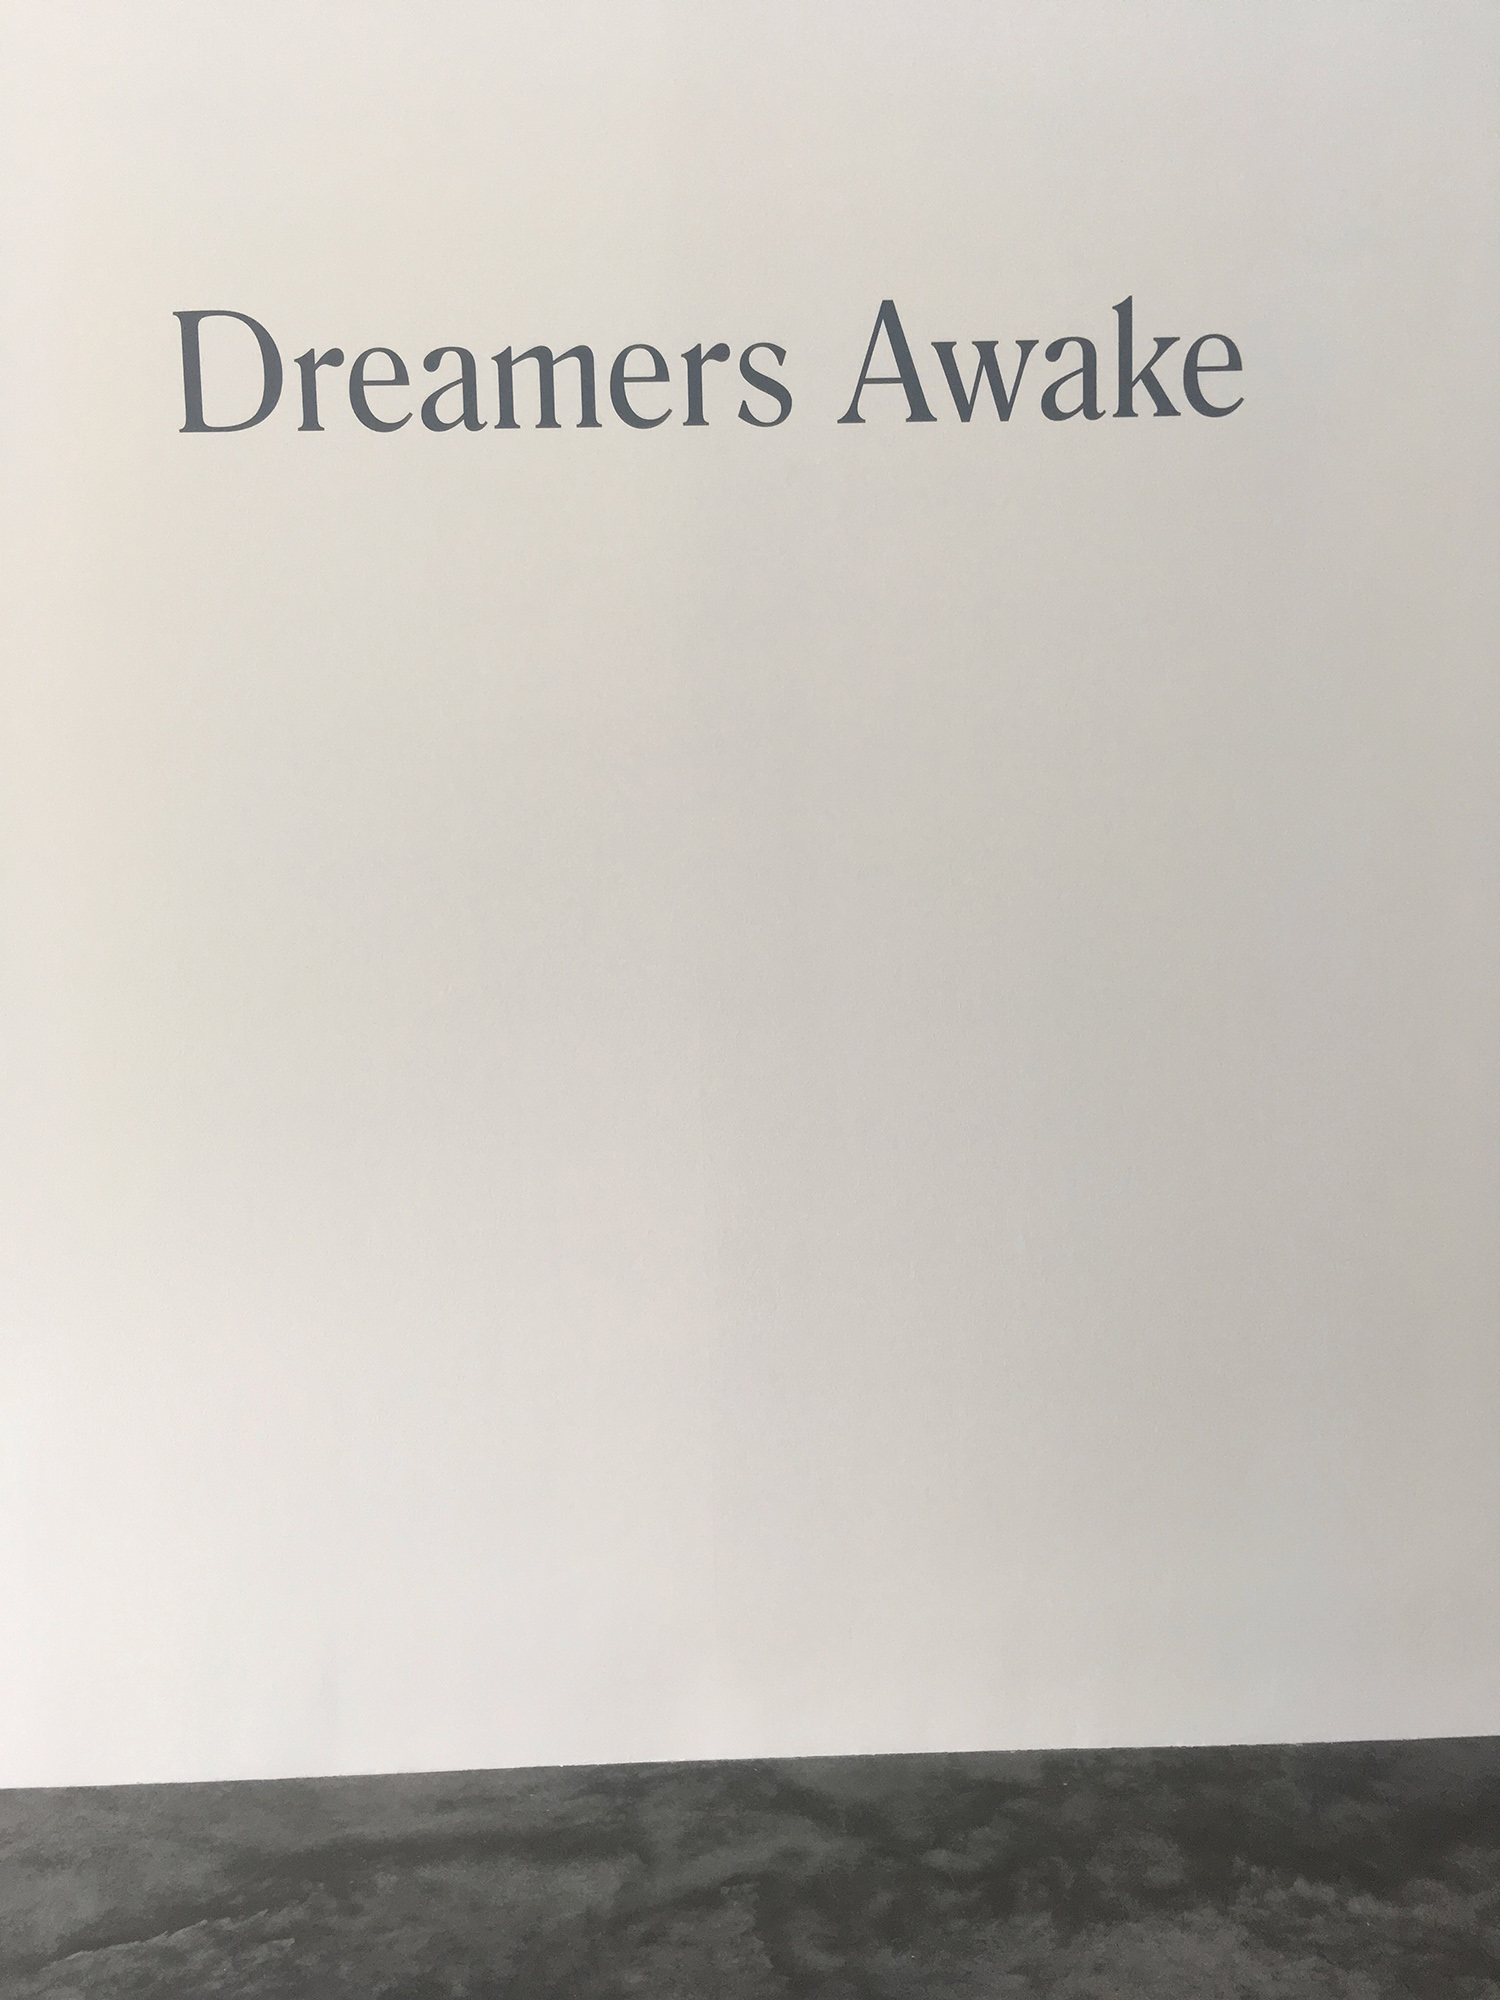 fleetwood of london - dreamers awake.jpg